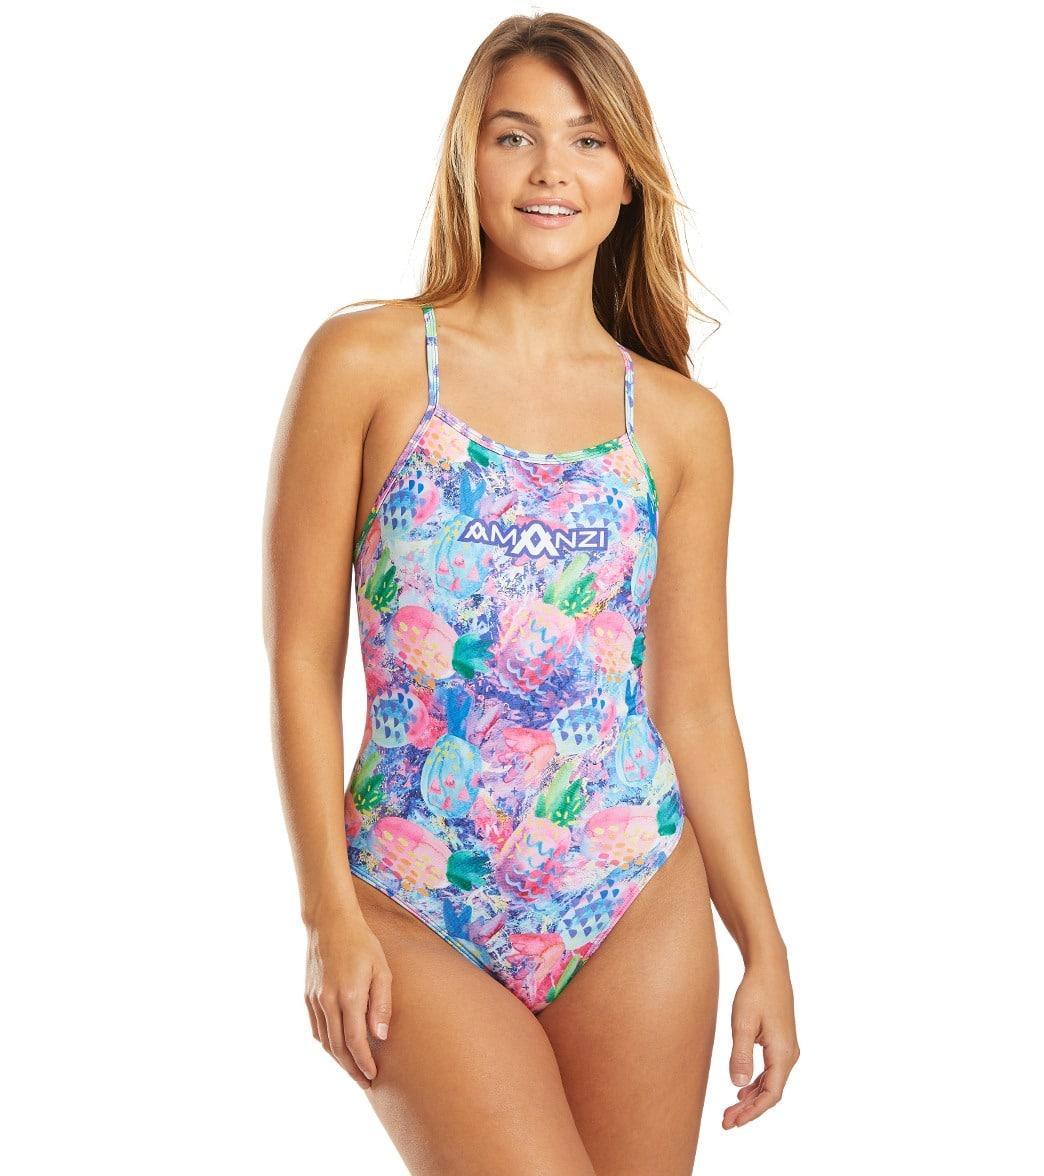 Amanzi Women's Fineapples One Piece Swimsuit